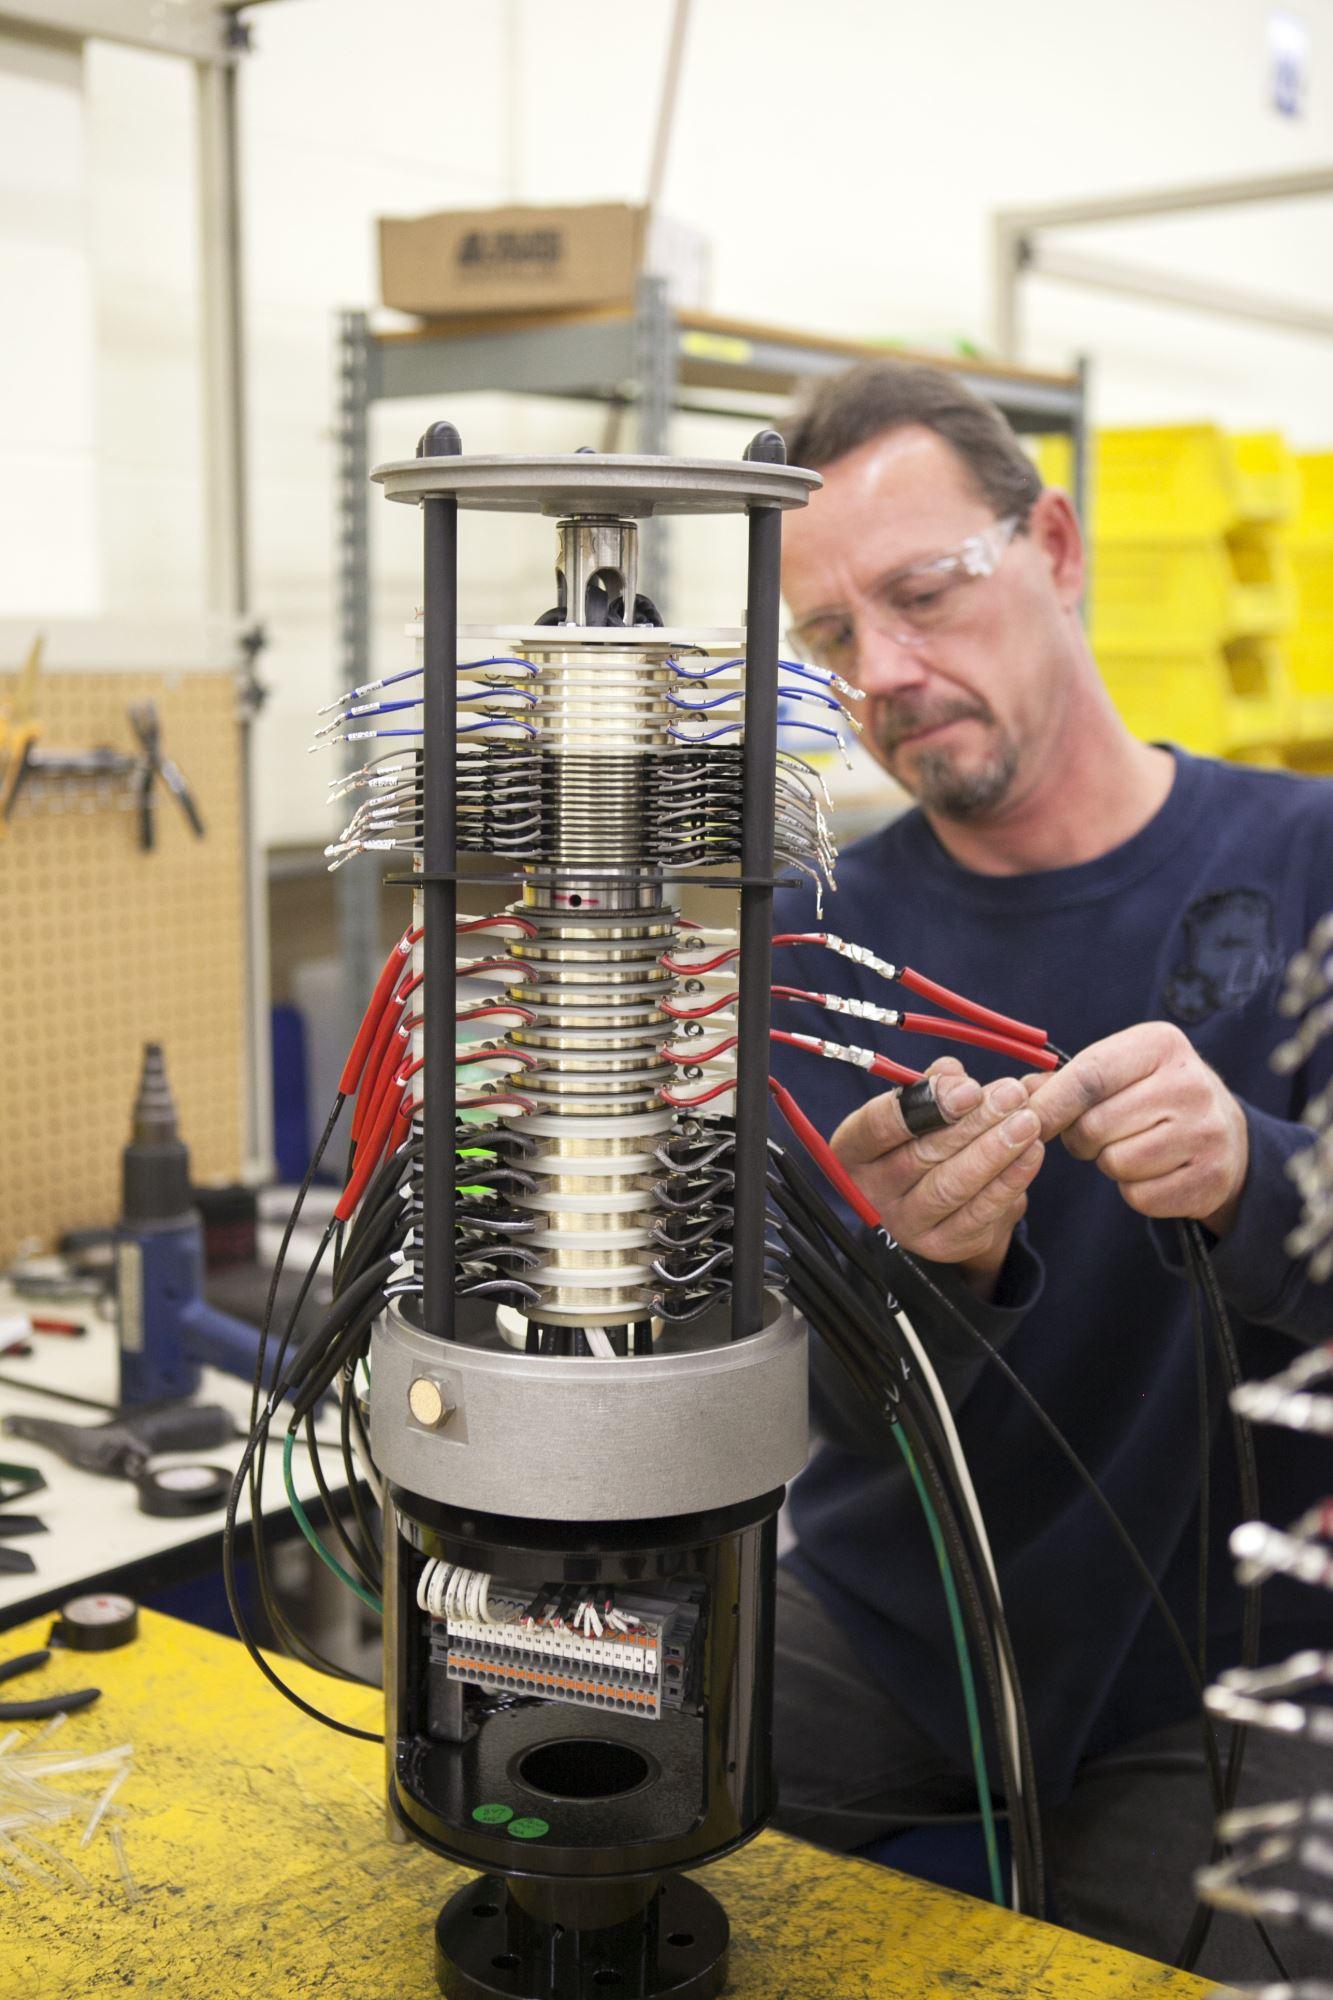 UEA Technician working on Slip Ring